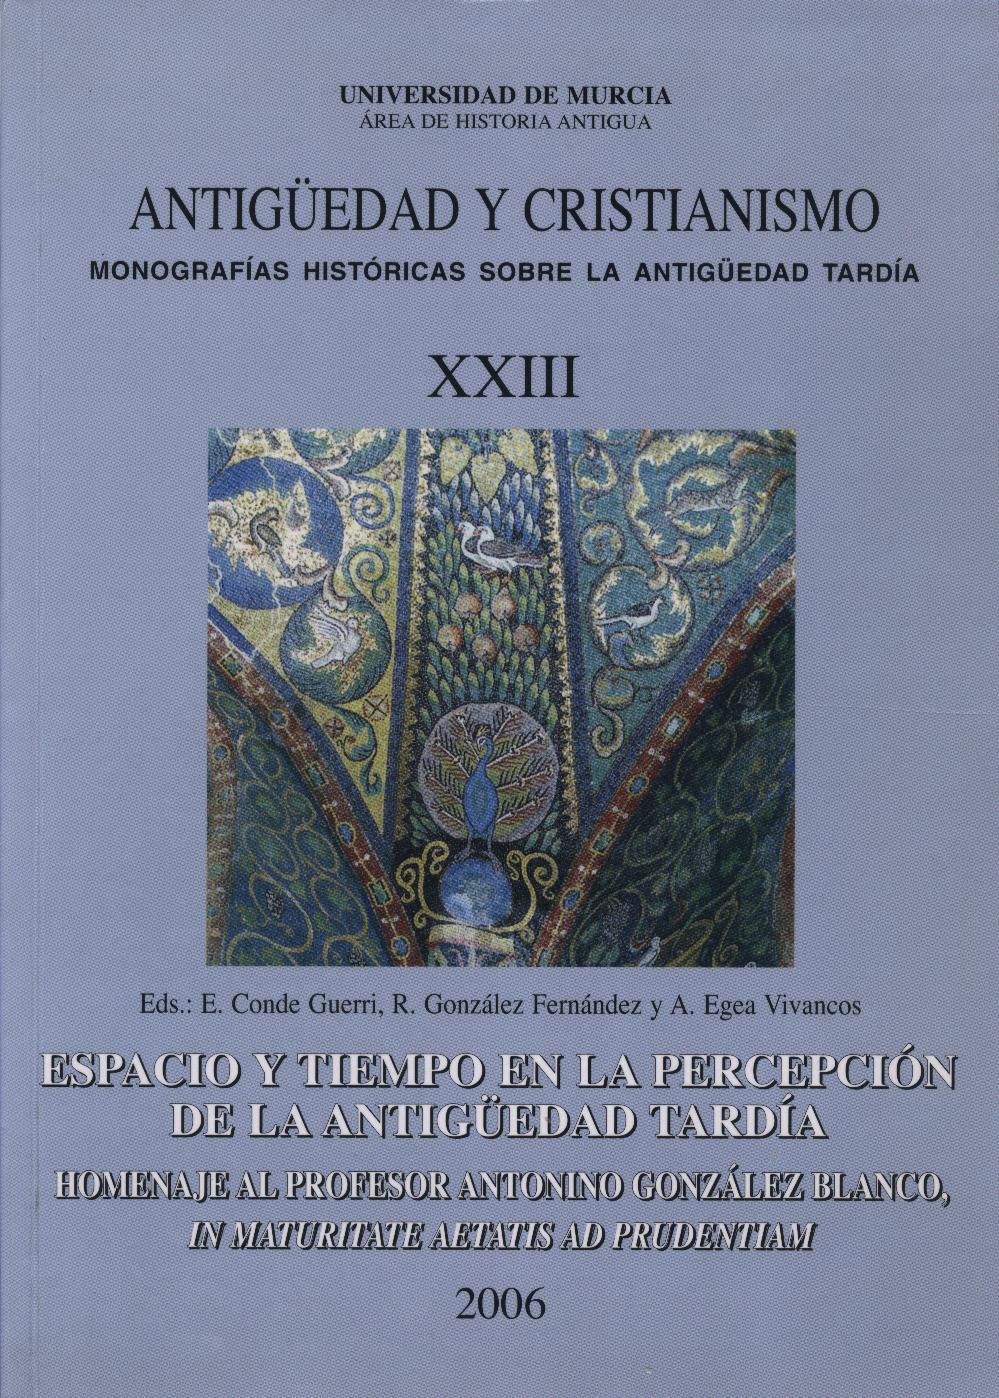 Antigüedad y Cristianismo XXIII